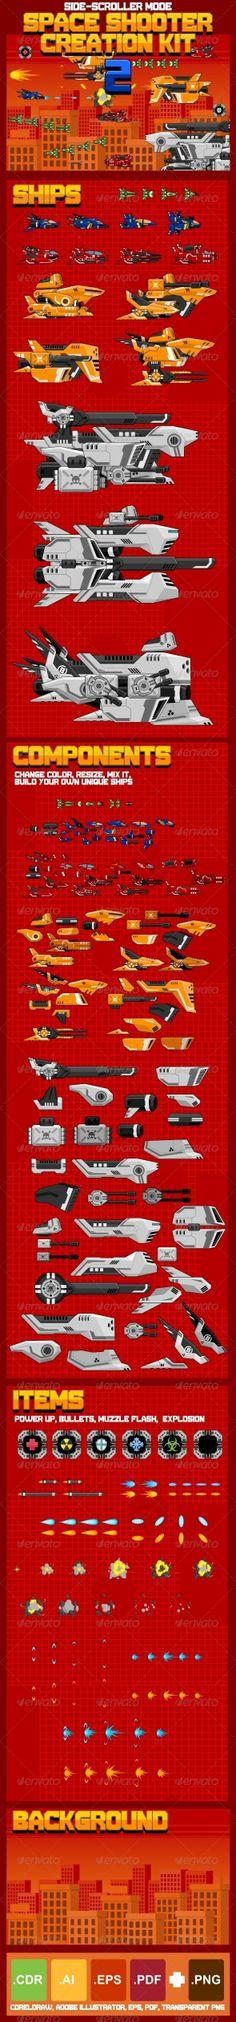 Space Shooter Creation Kit 2 by Zuhria Alfitra, via Behance